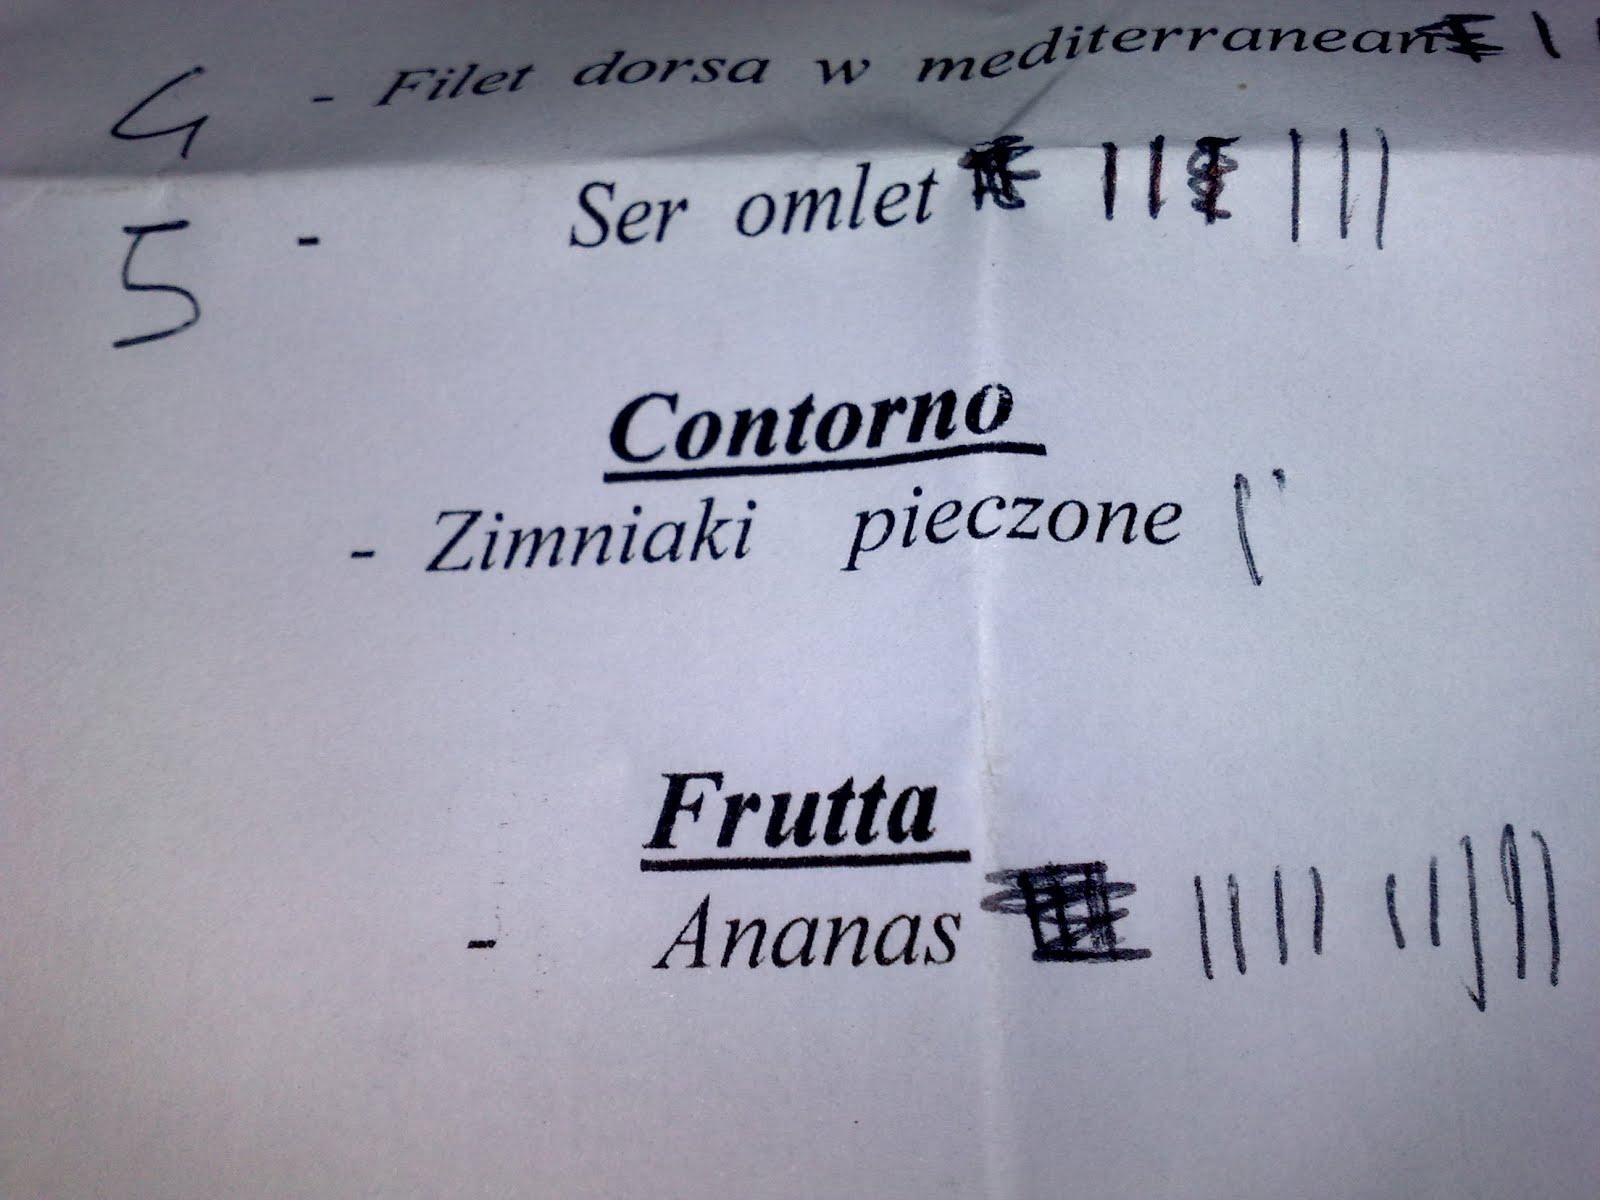 Filet dorsa w mediterranean; Ser omlet; Zimniaki pieczone